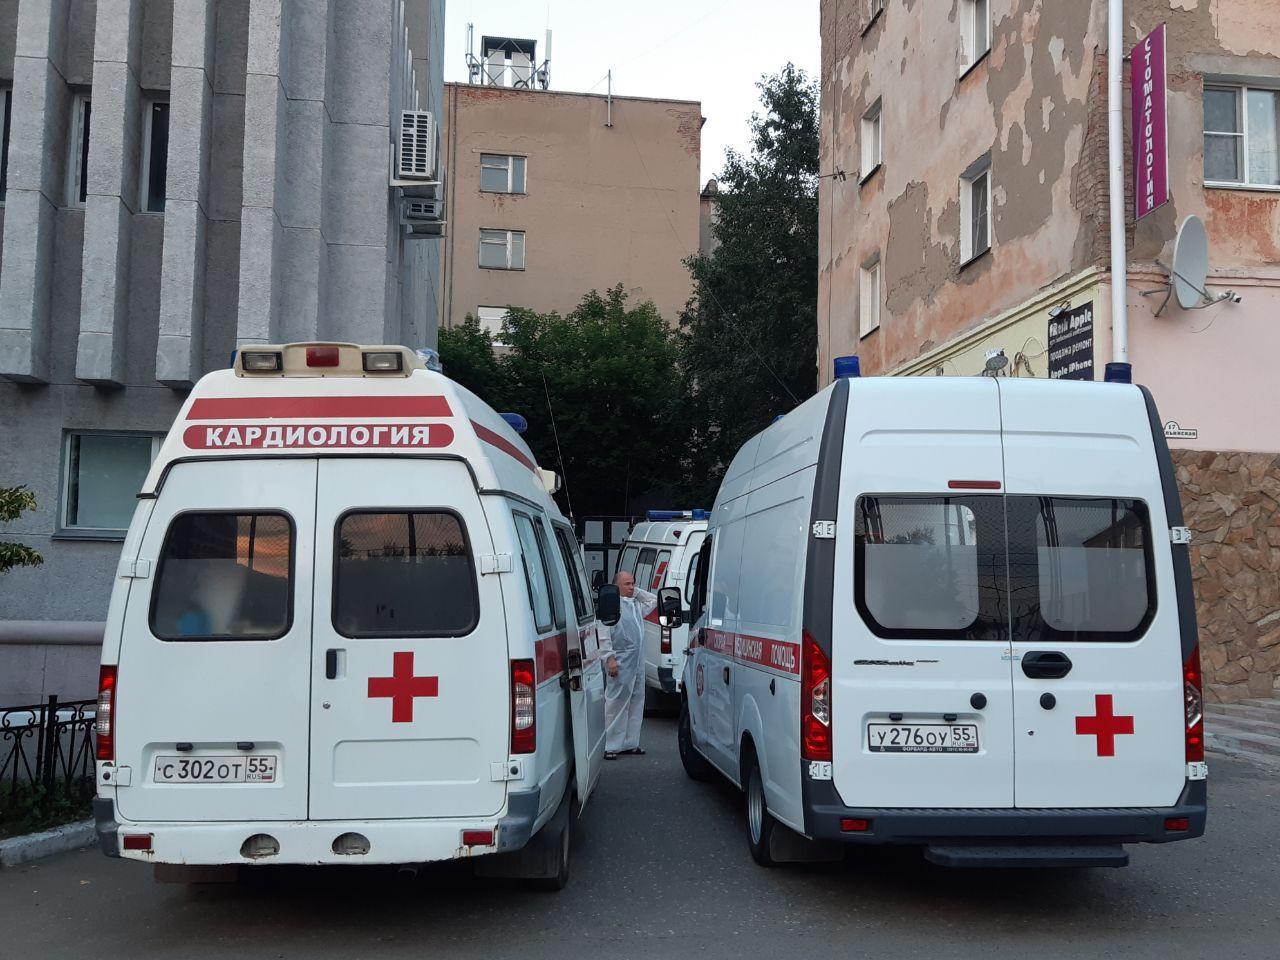 Коронавирусом заразились еще 93 омича #Омск #Общество #Сегодня